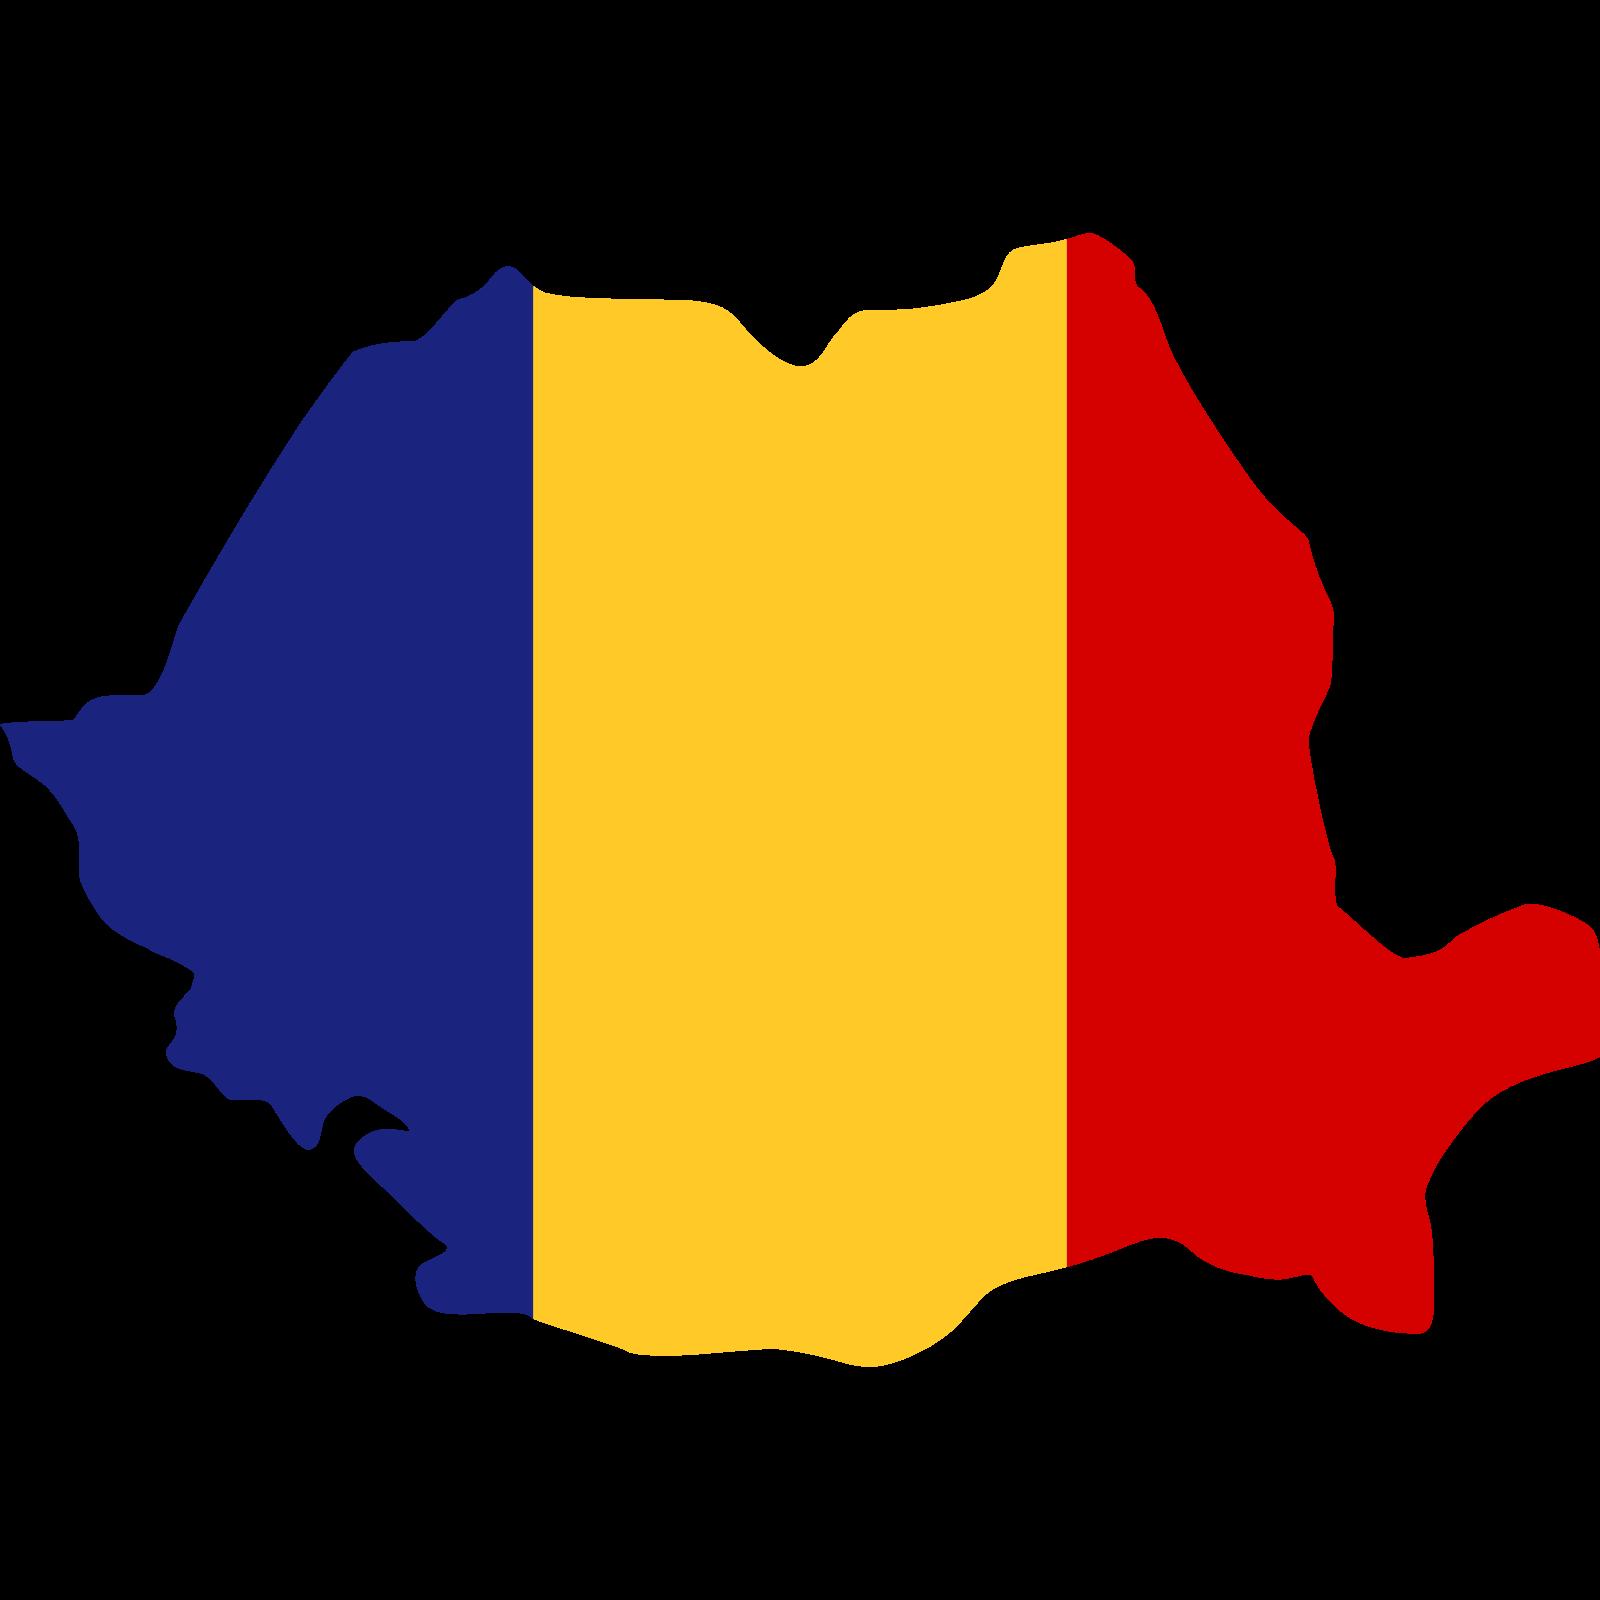 Romania Map icon